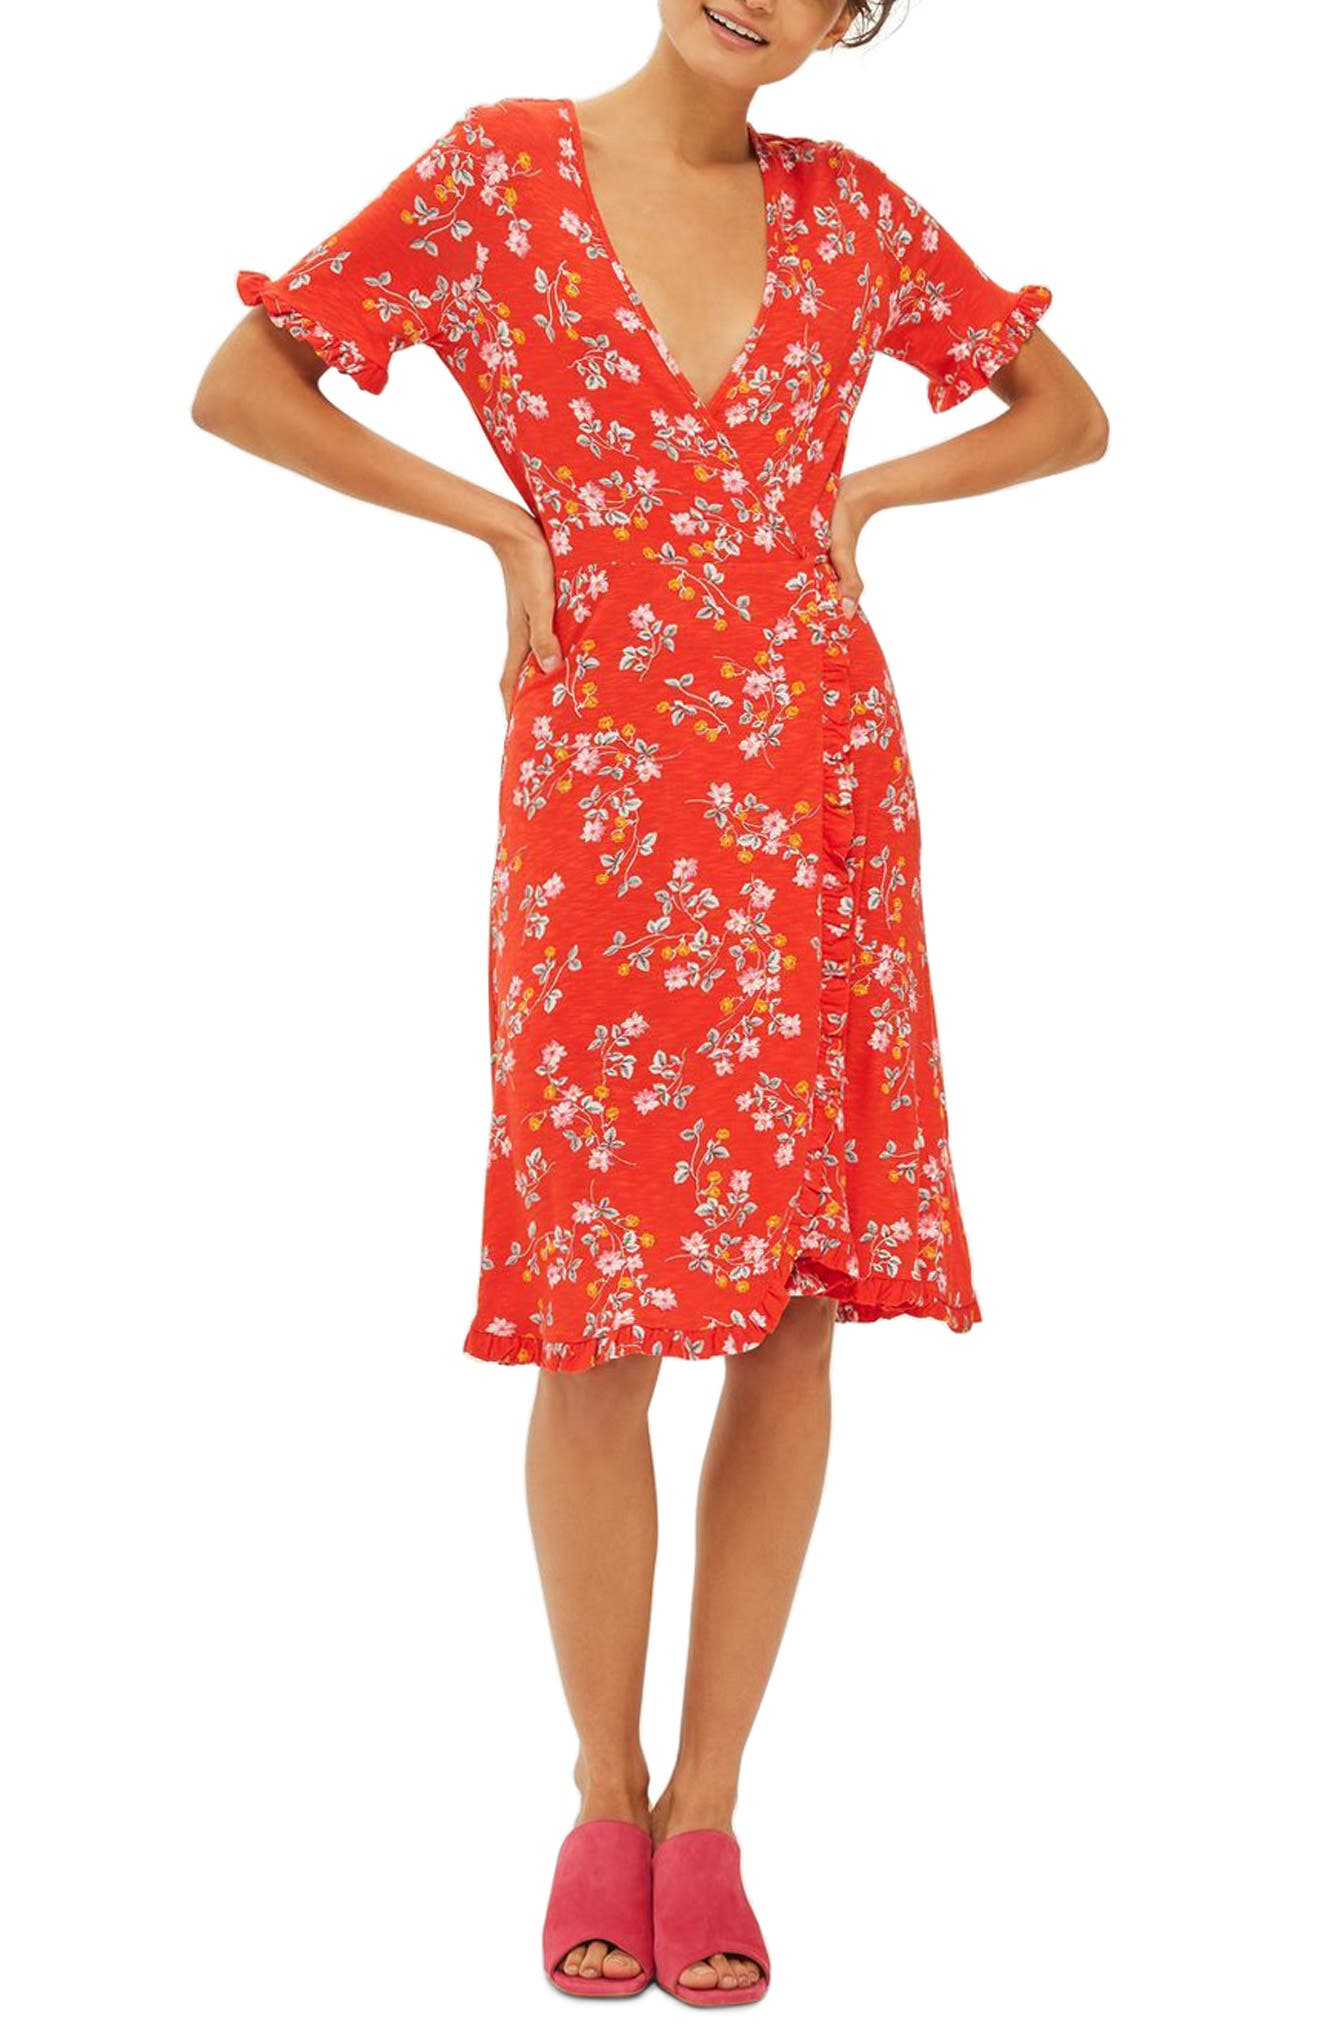 Topshop Disty Ruffle Wrap Dress